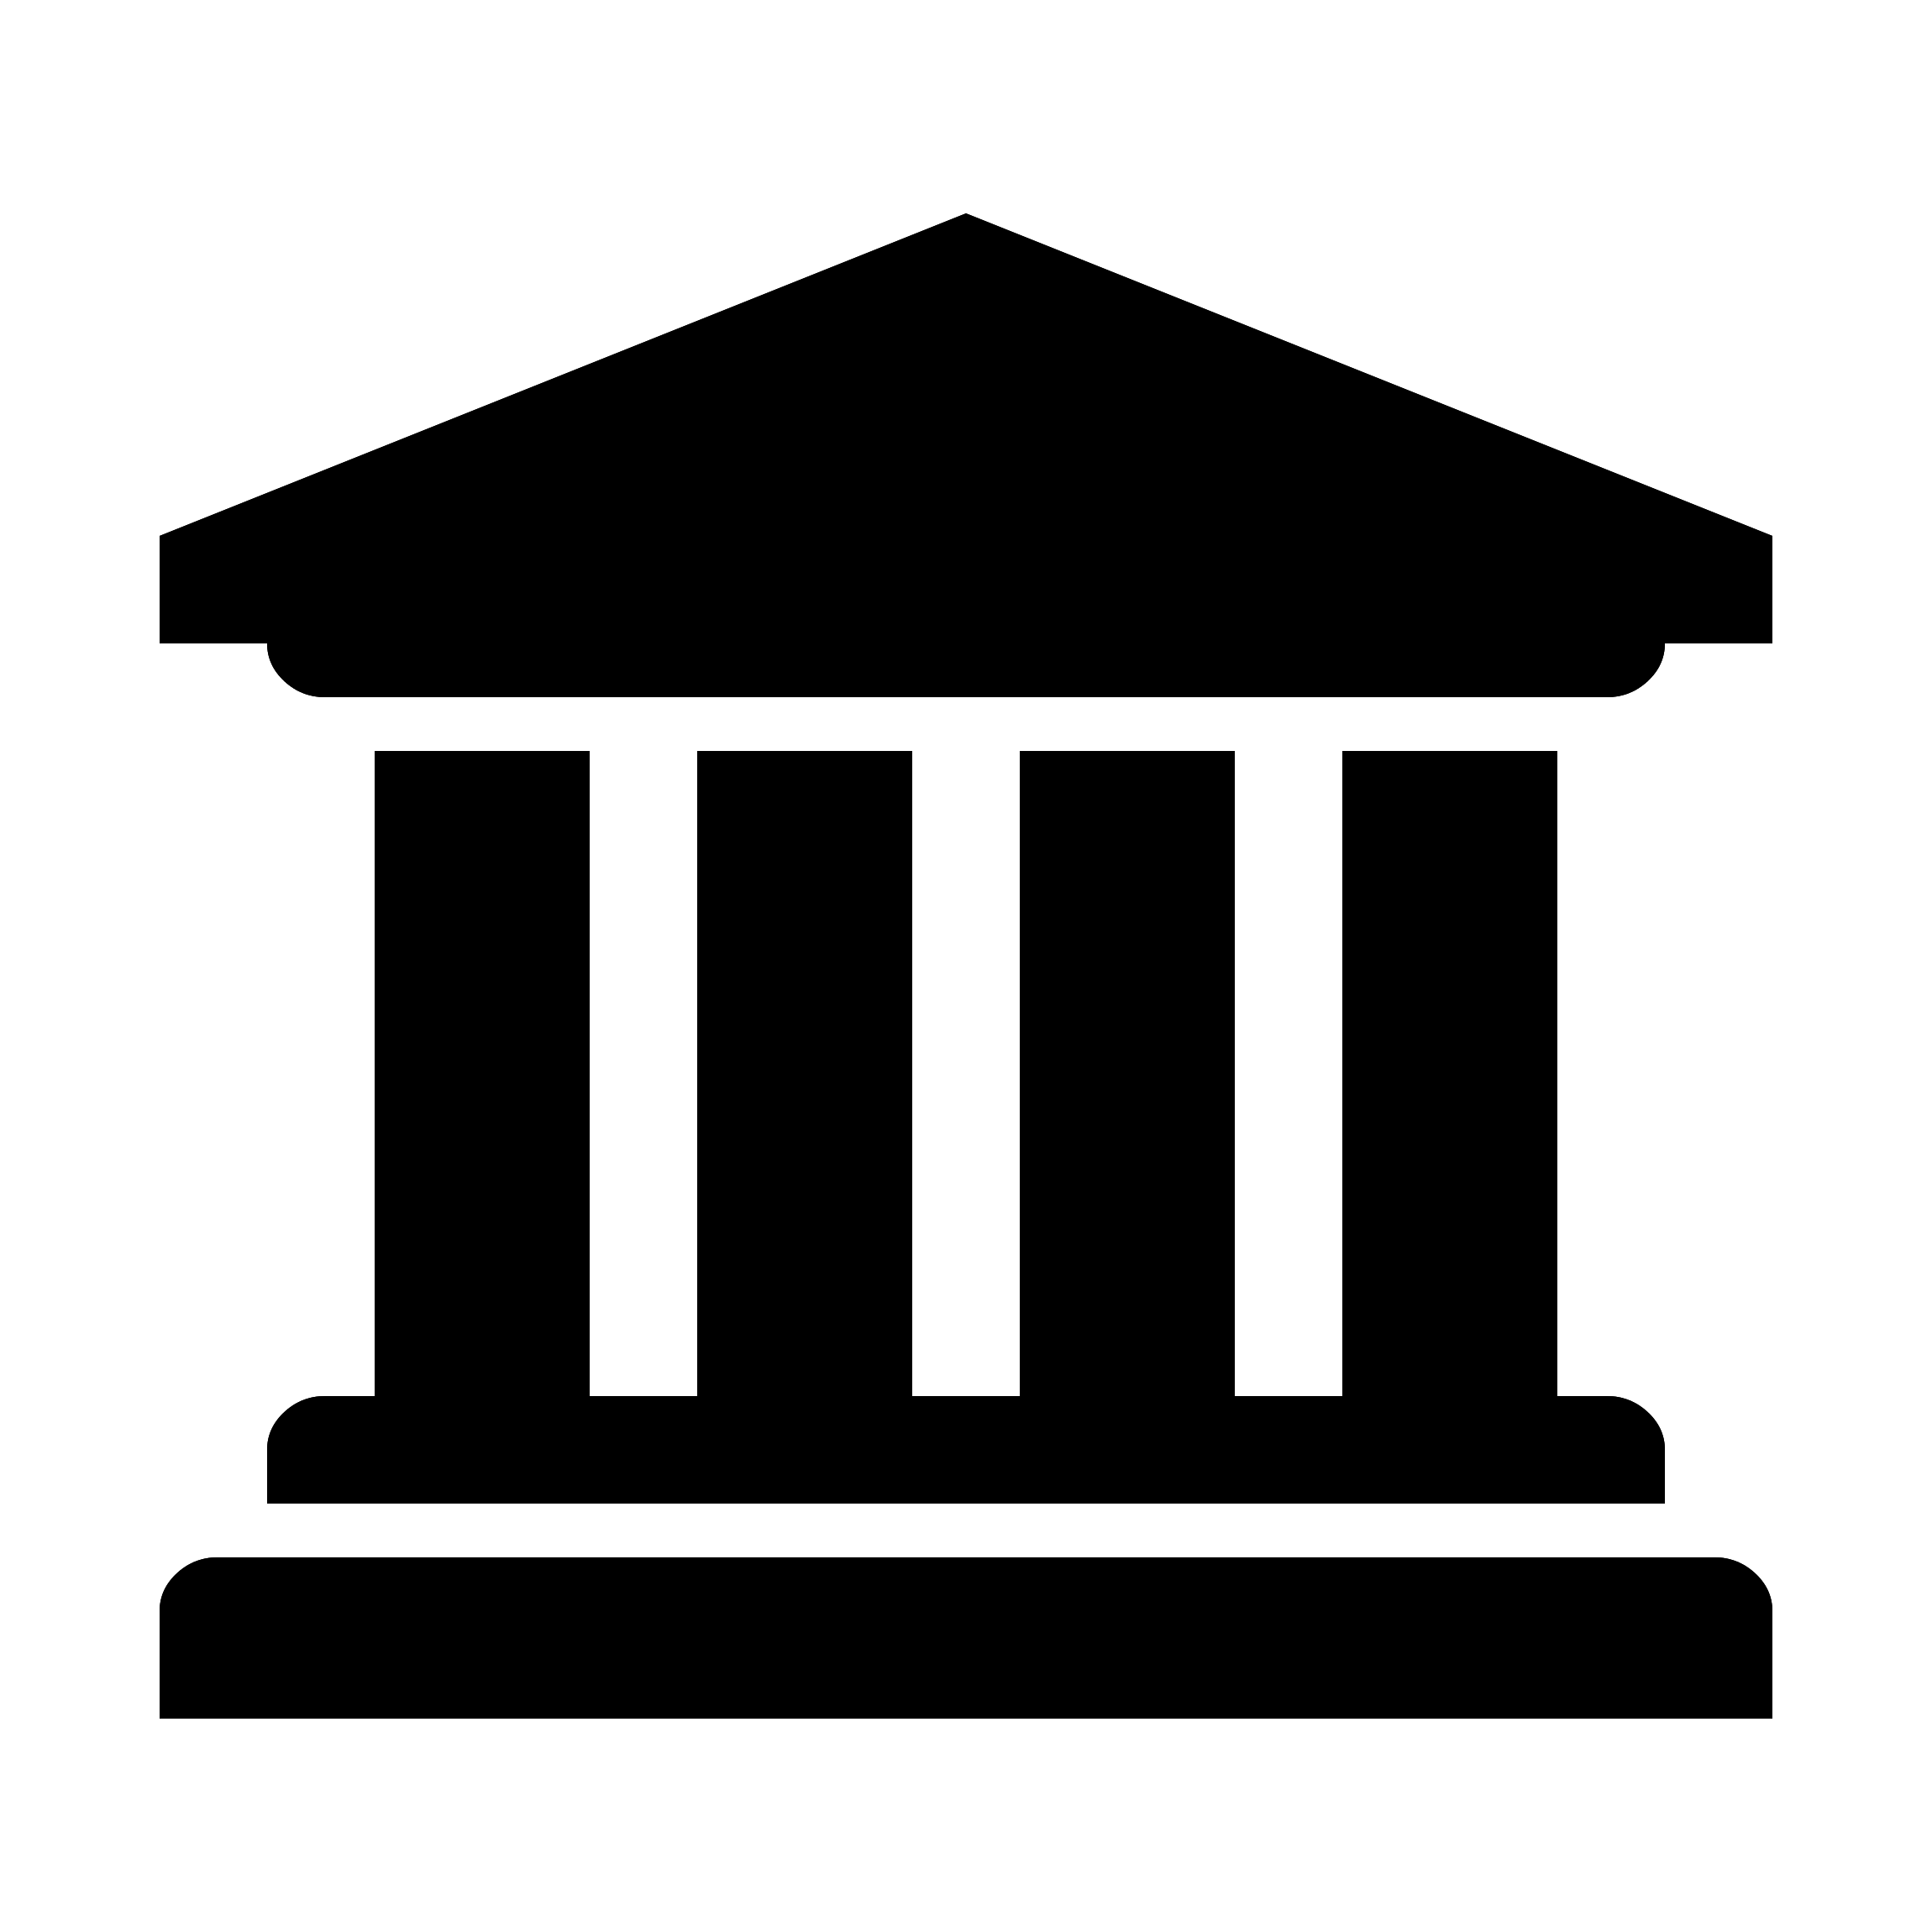 data/images/bank.png